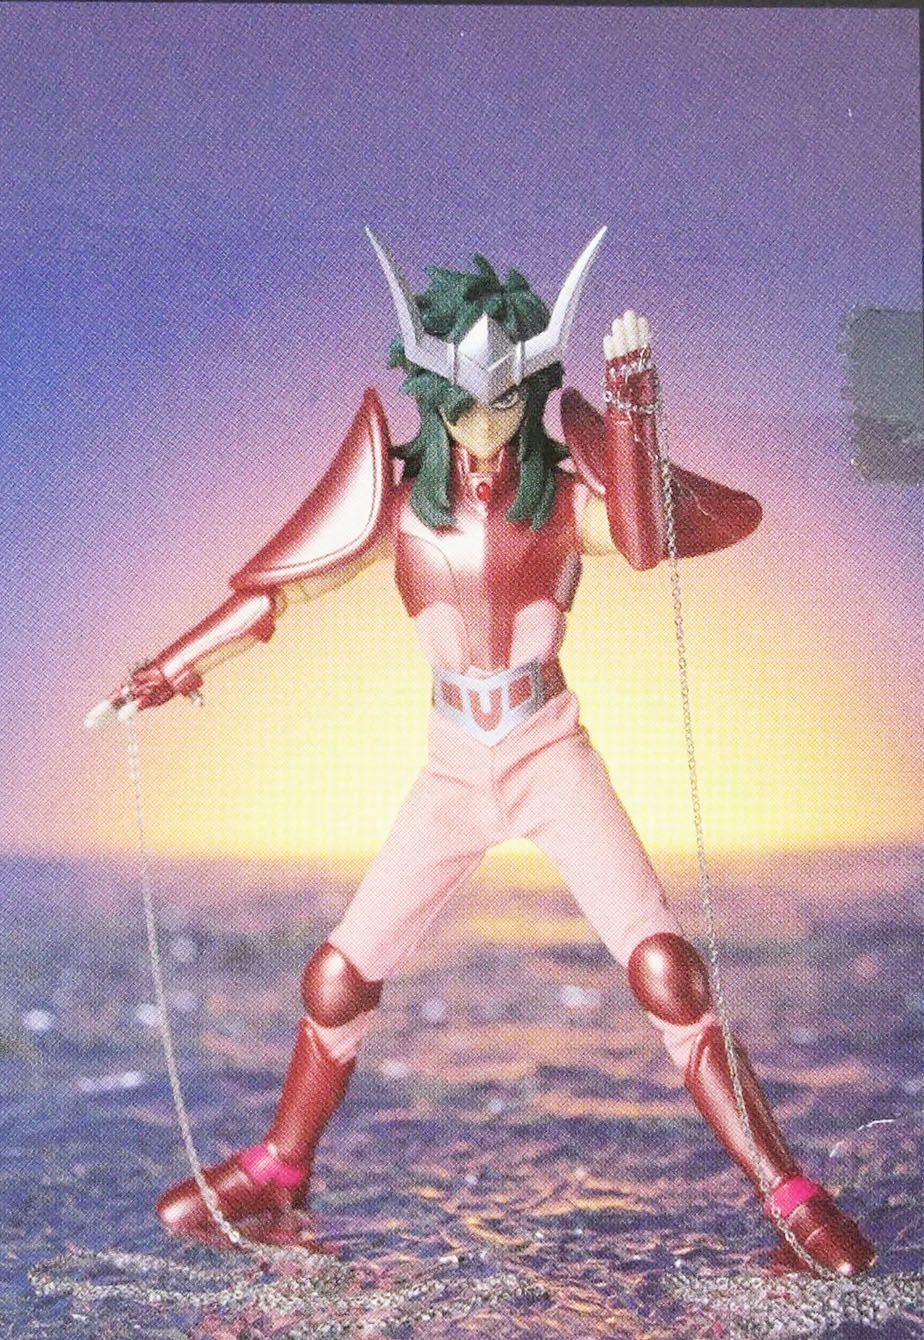 Saint Seiya - Hyper Hero Real Action Doll - Andromeda Shun - Ohtsuka Kikaku